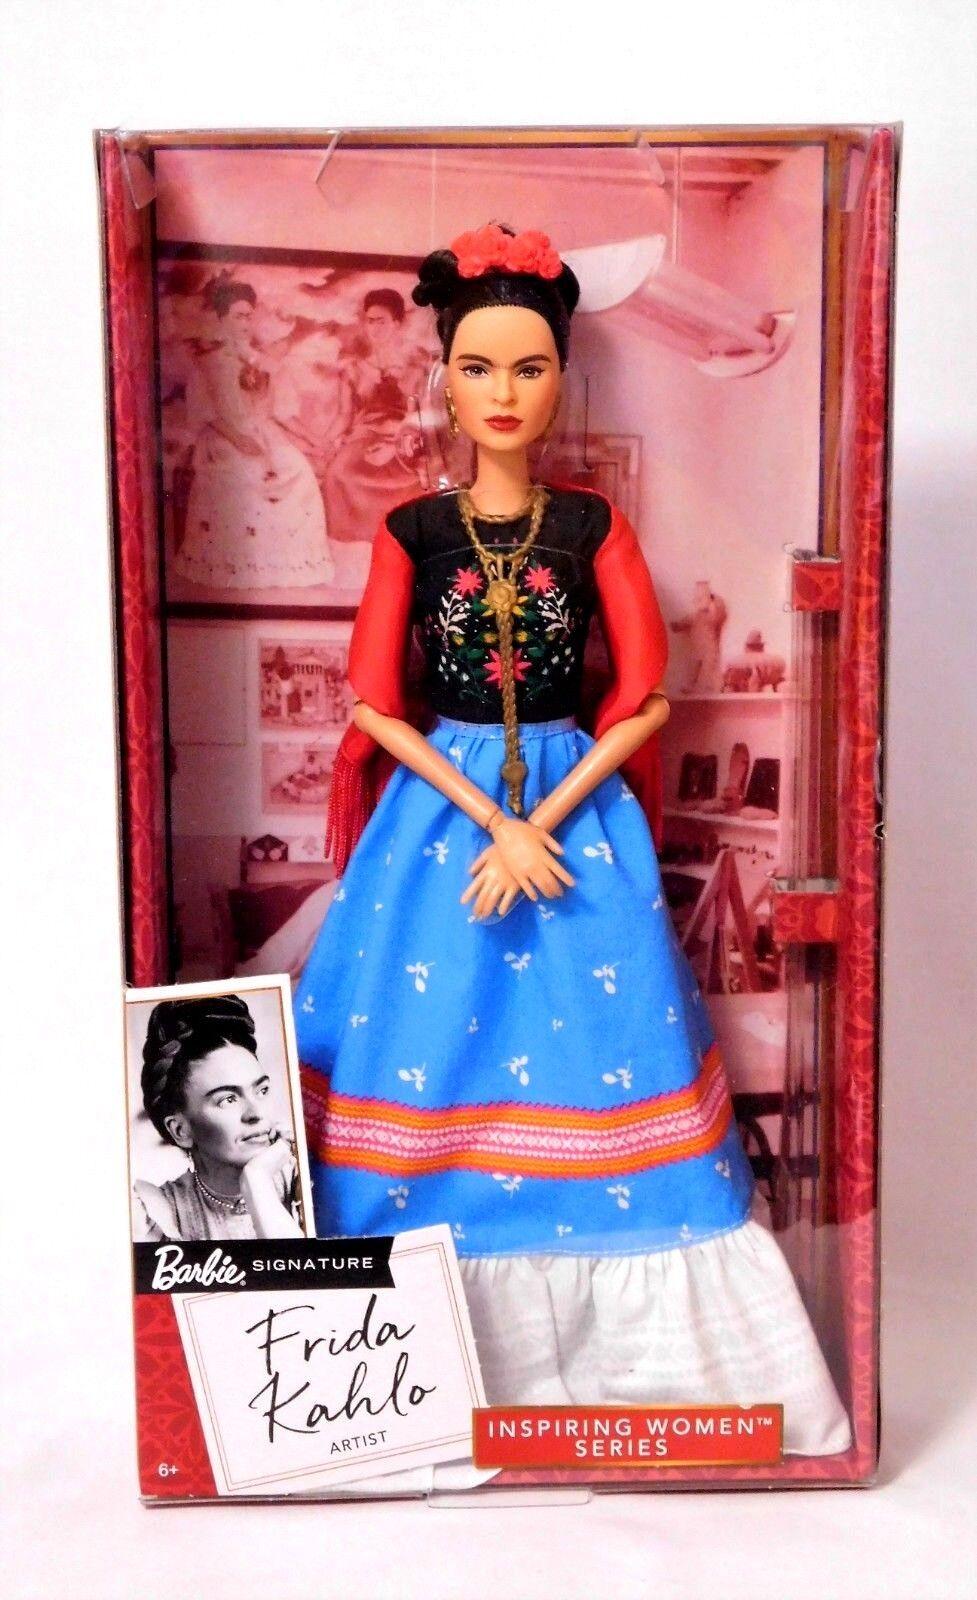 Frida Kahlo (activista artista) inspirador mujeres 2018 Barbie _ FJH65 _ en Caja Original ___  última